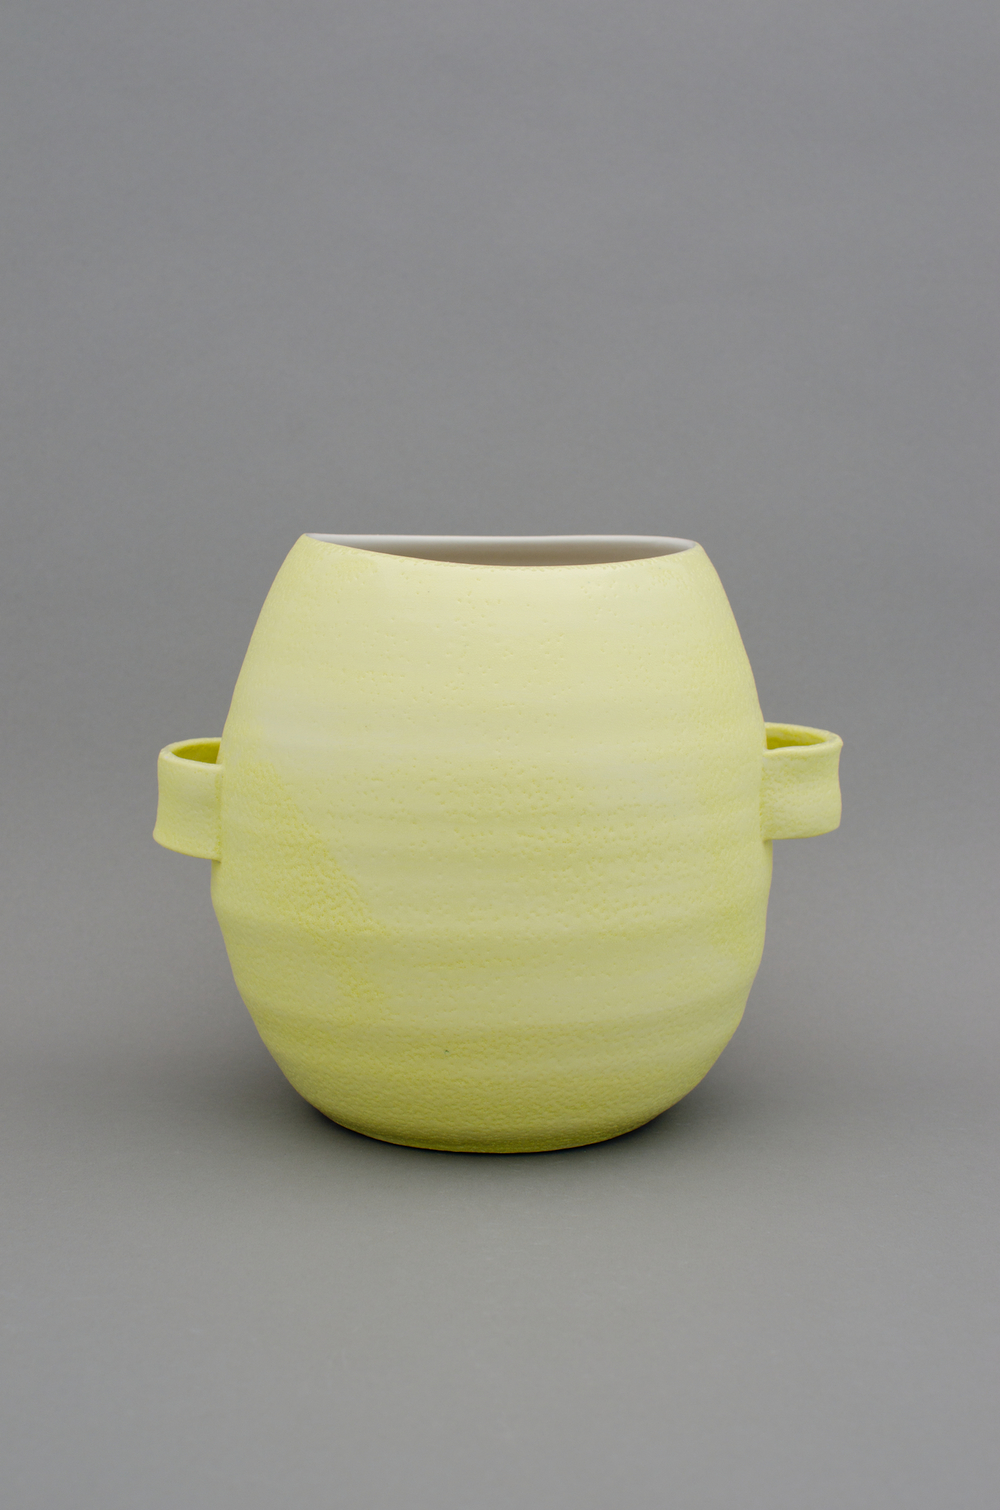 Shio Kusaka  Untitled (handle 1)  2012 Porcelain 9h x 10 1/4w x 8 1/4d in SK389